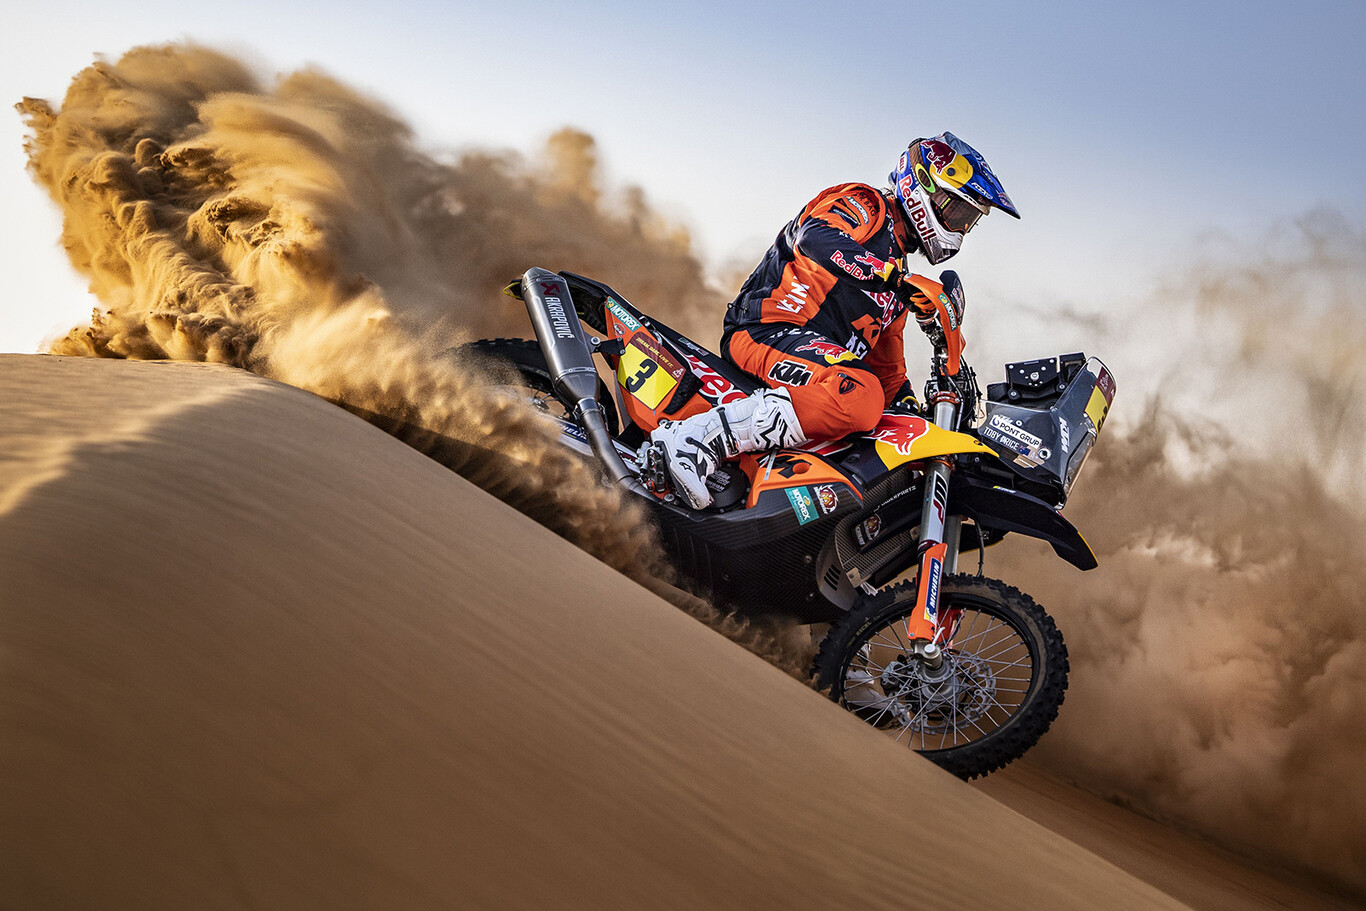 Rally Dakar 2021, previo: pilotos de motos favoritos, recorrido, horarios y  más